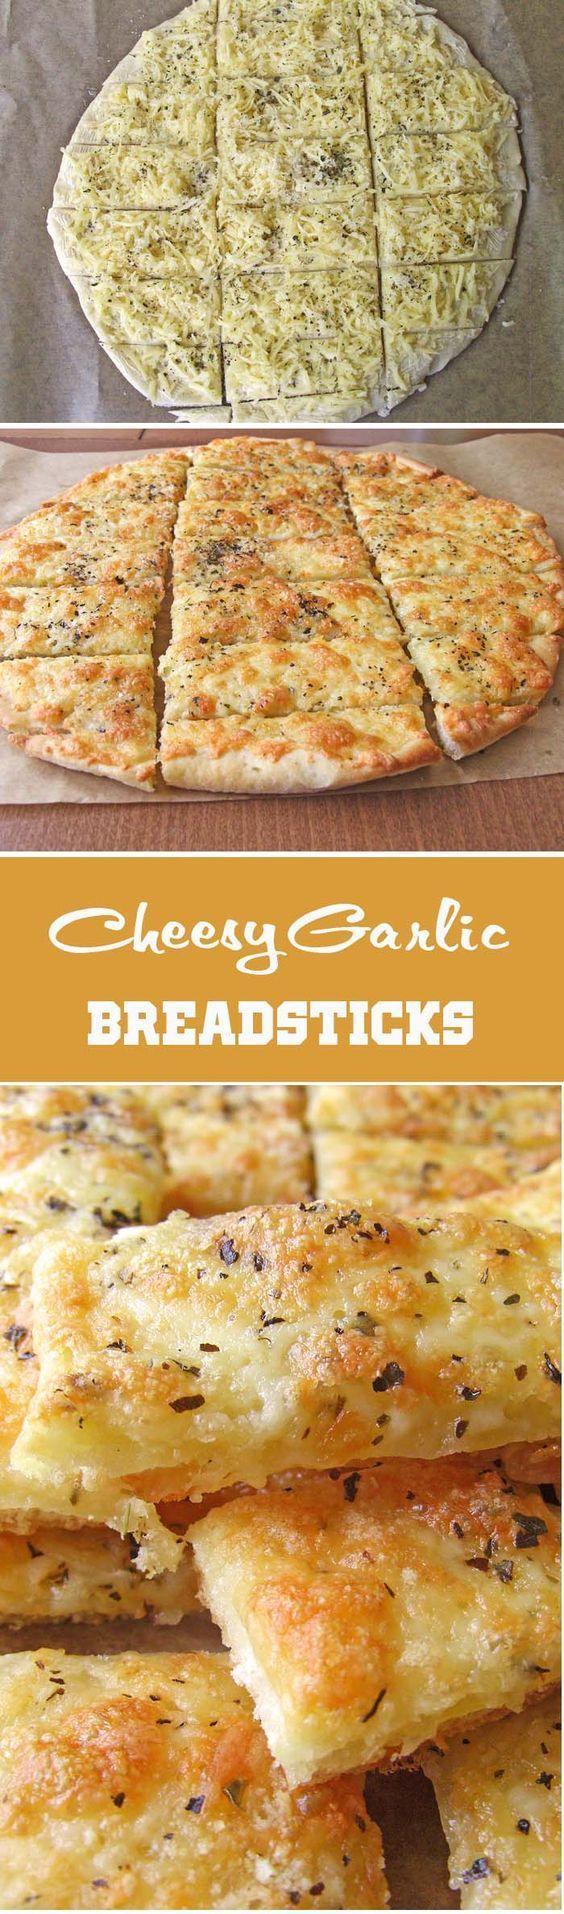 Easy Cheesy Garlic Breadsticks Recipe   Buzz Inspired